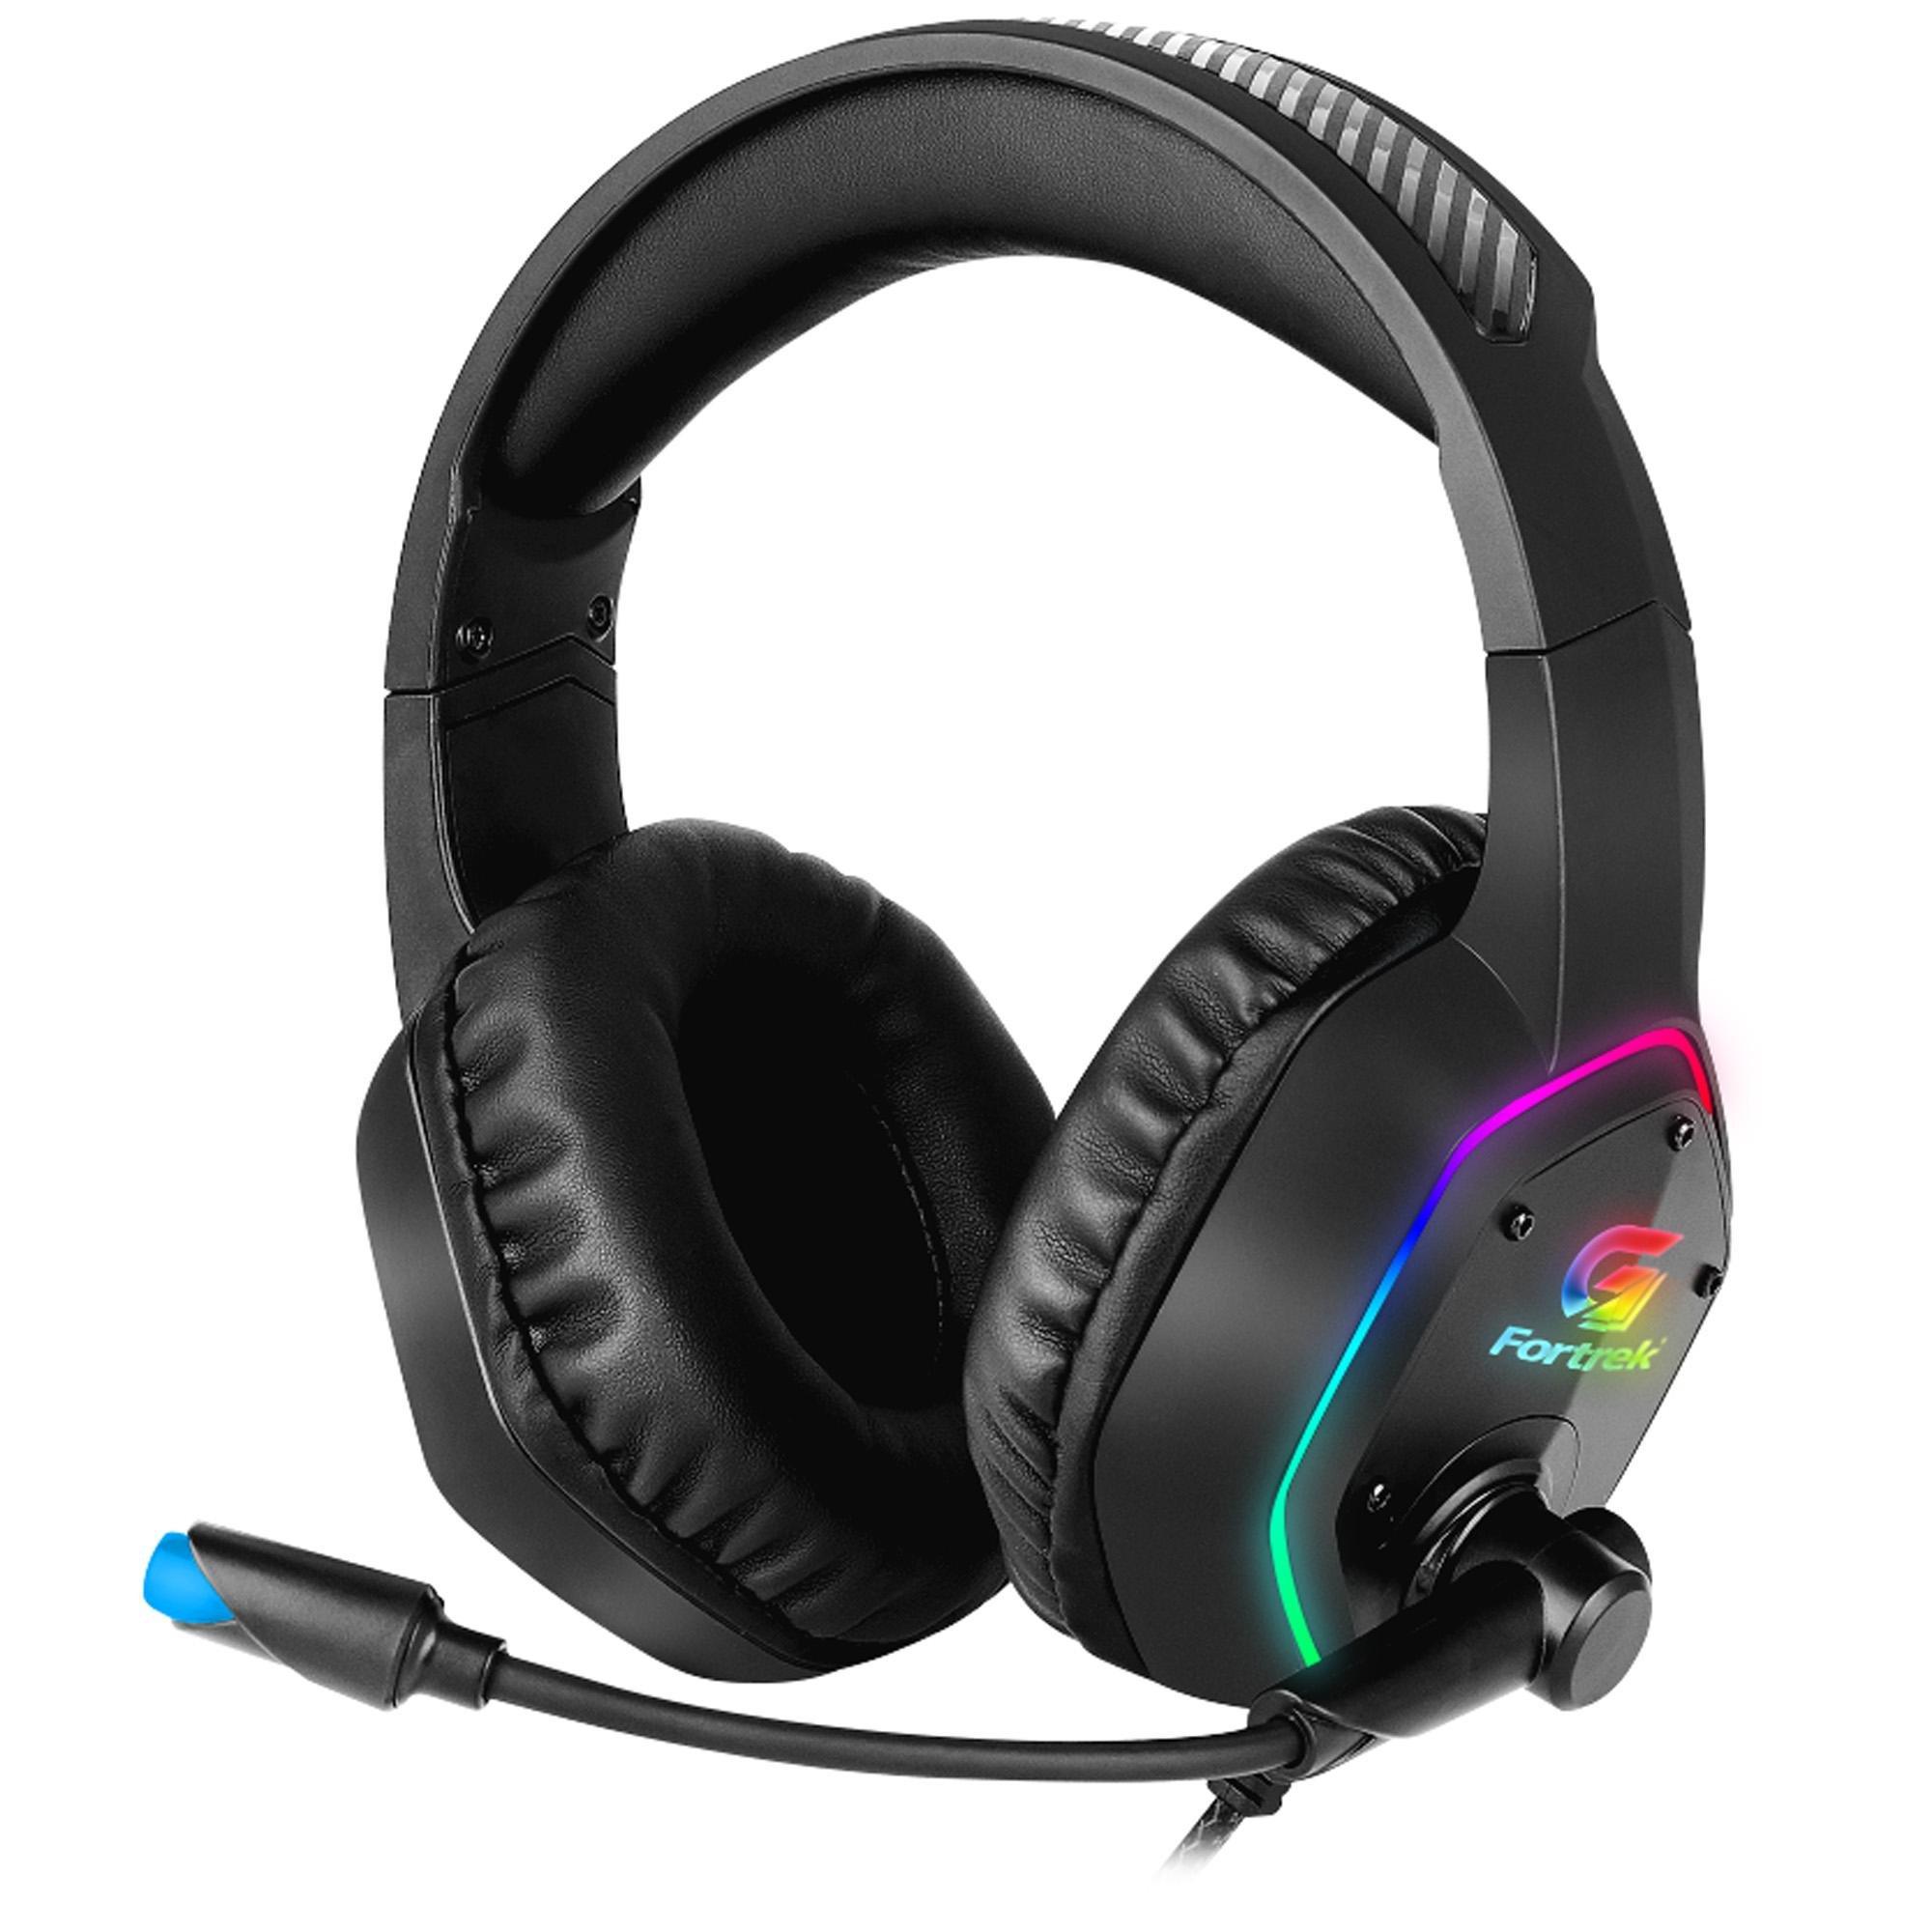 Headset Gamer RGB Blackfire Preto FORTREK